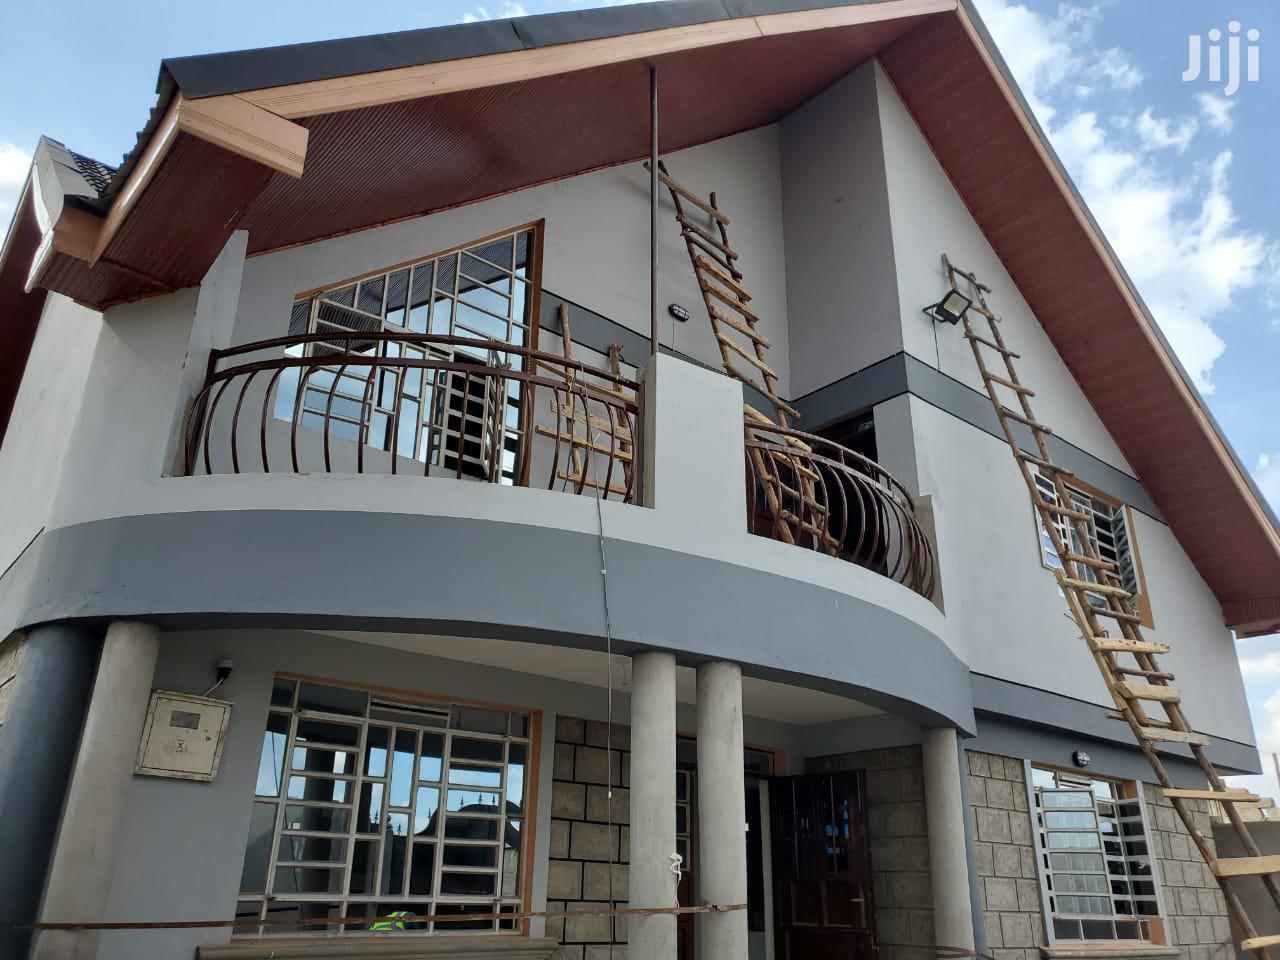 4 Bedroom House For Sale In Matangi Ruiru.